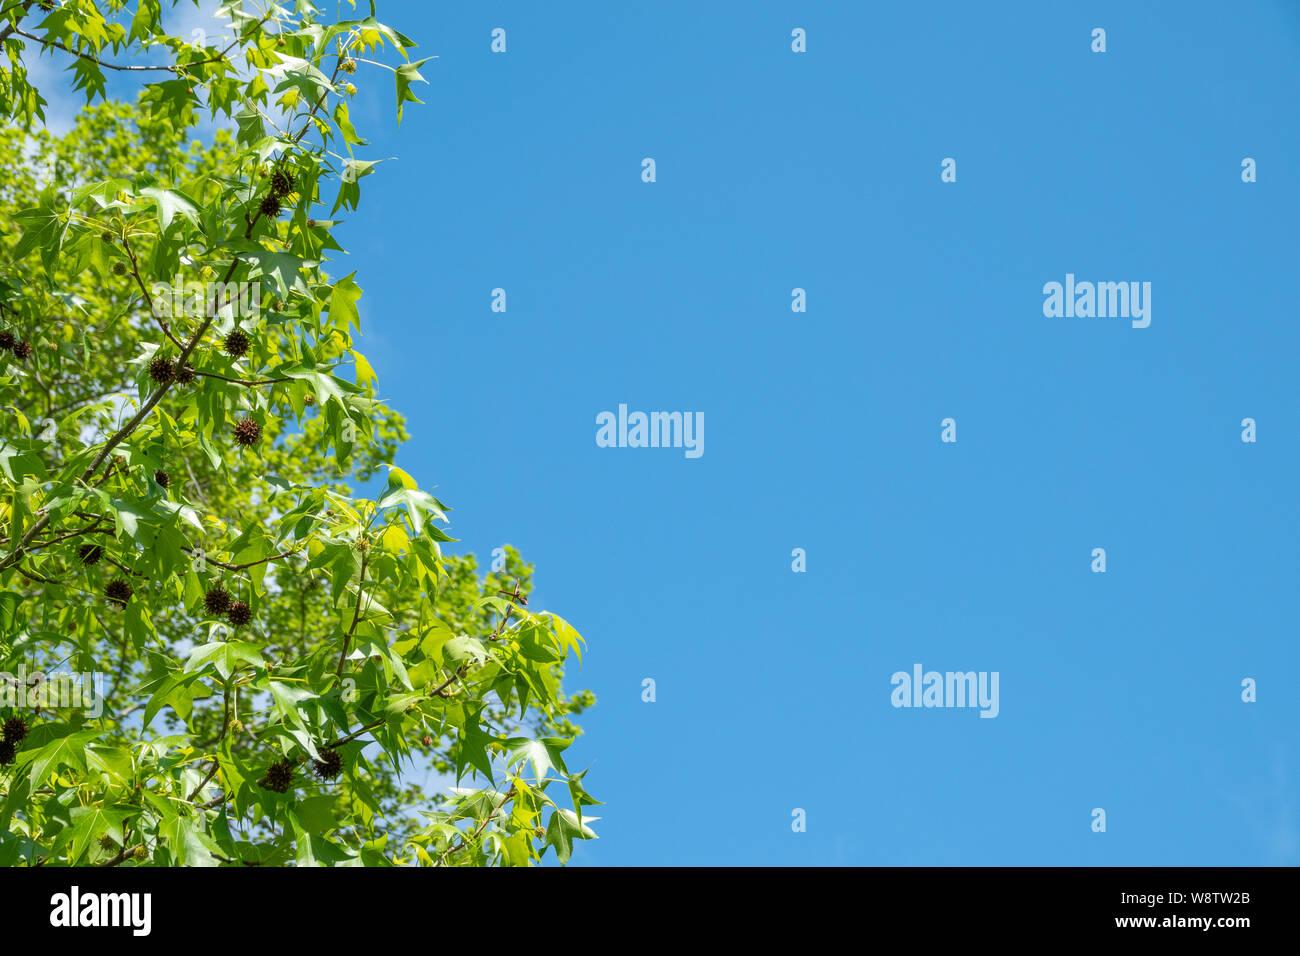 American sweetgum on a background of blue sky. American sweetgum, Also known as amber tree, American storax, hazel pine, bilsted, redgum satin-walnut, Stock Photo